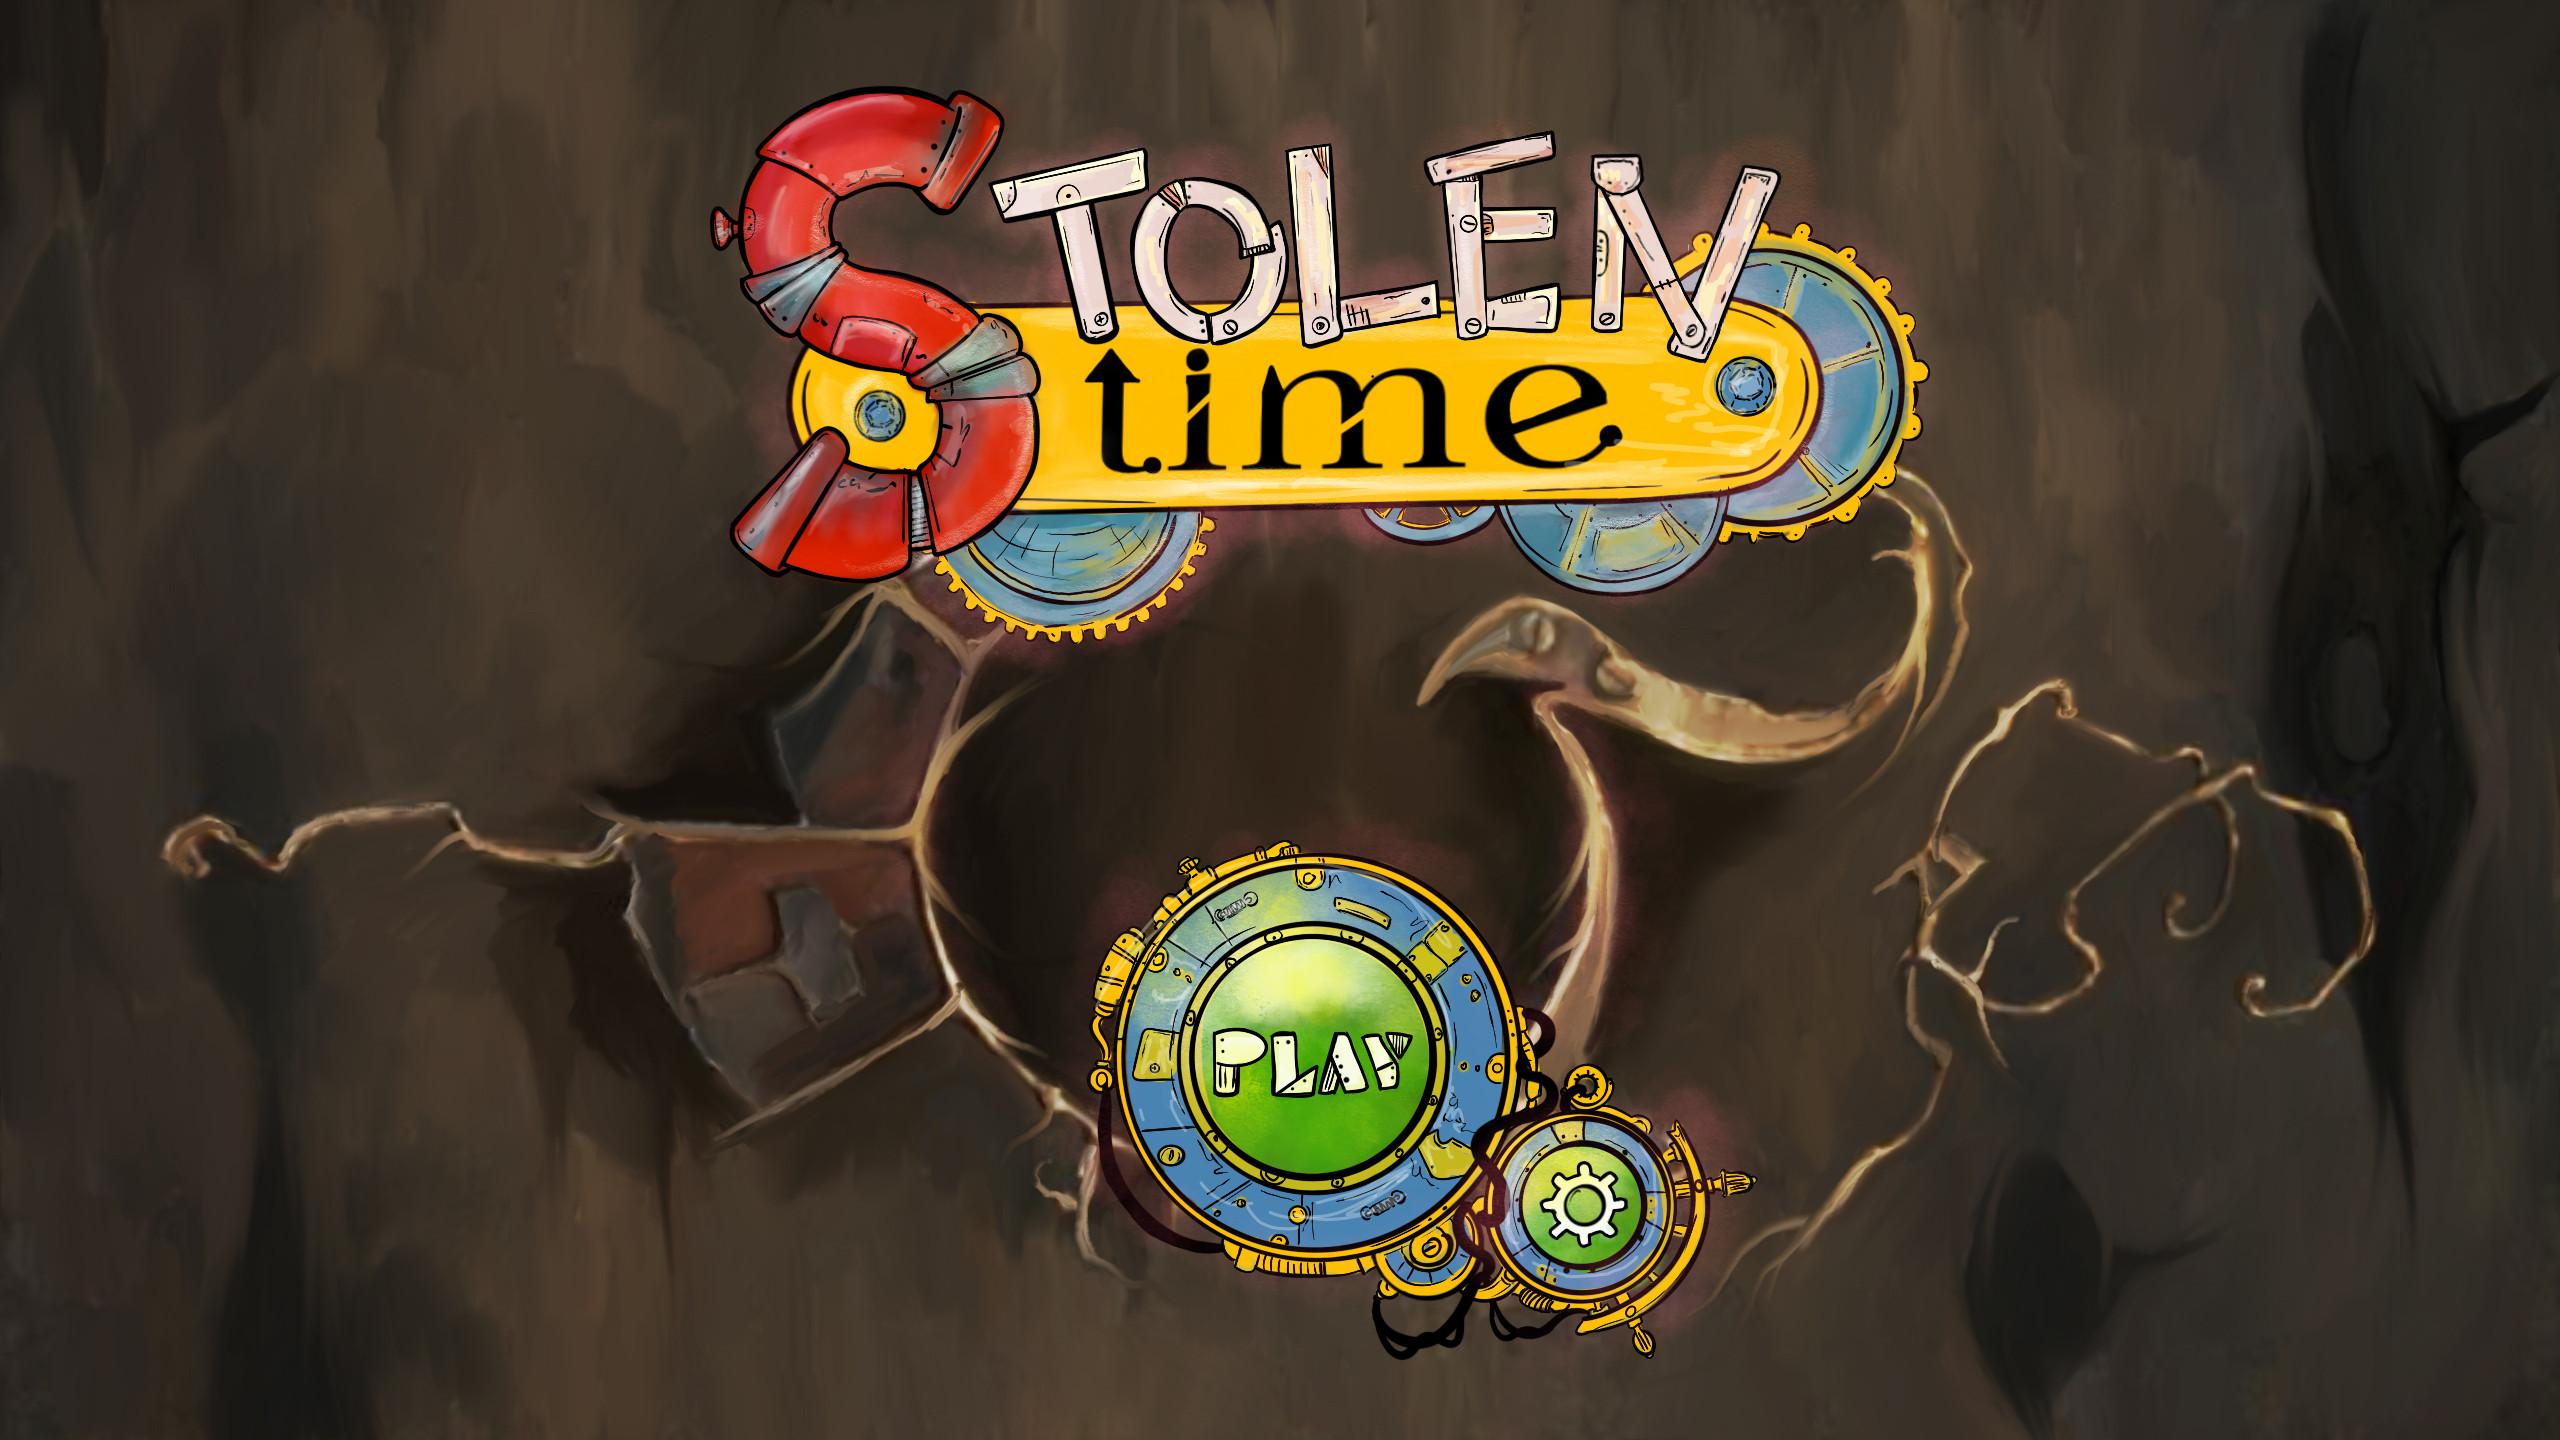 Title Screen concept